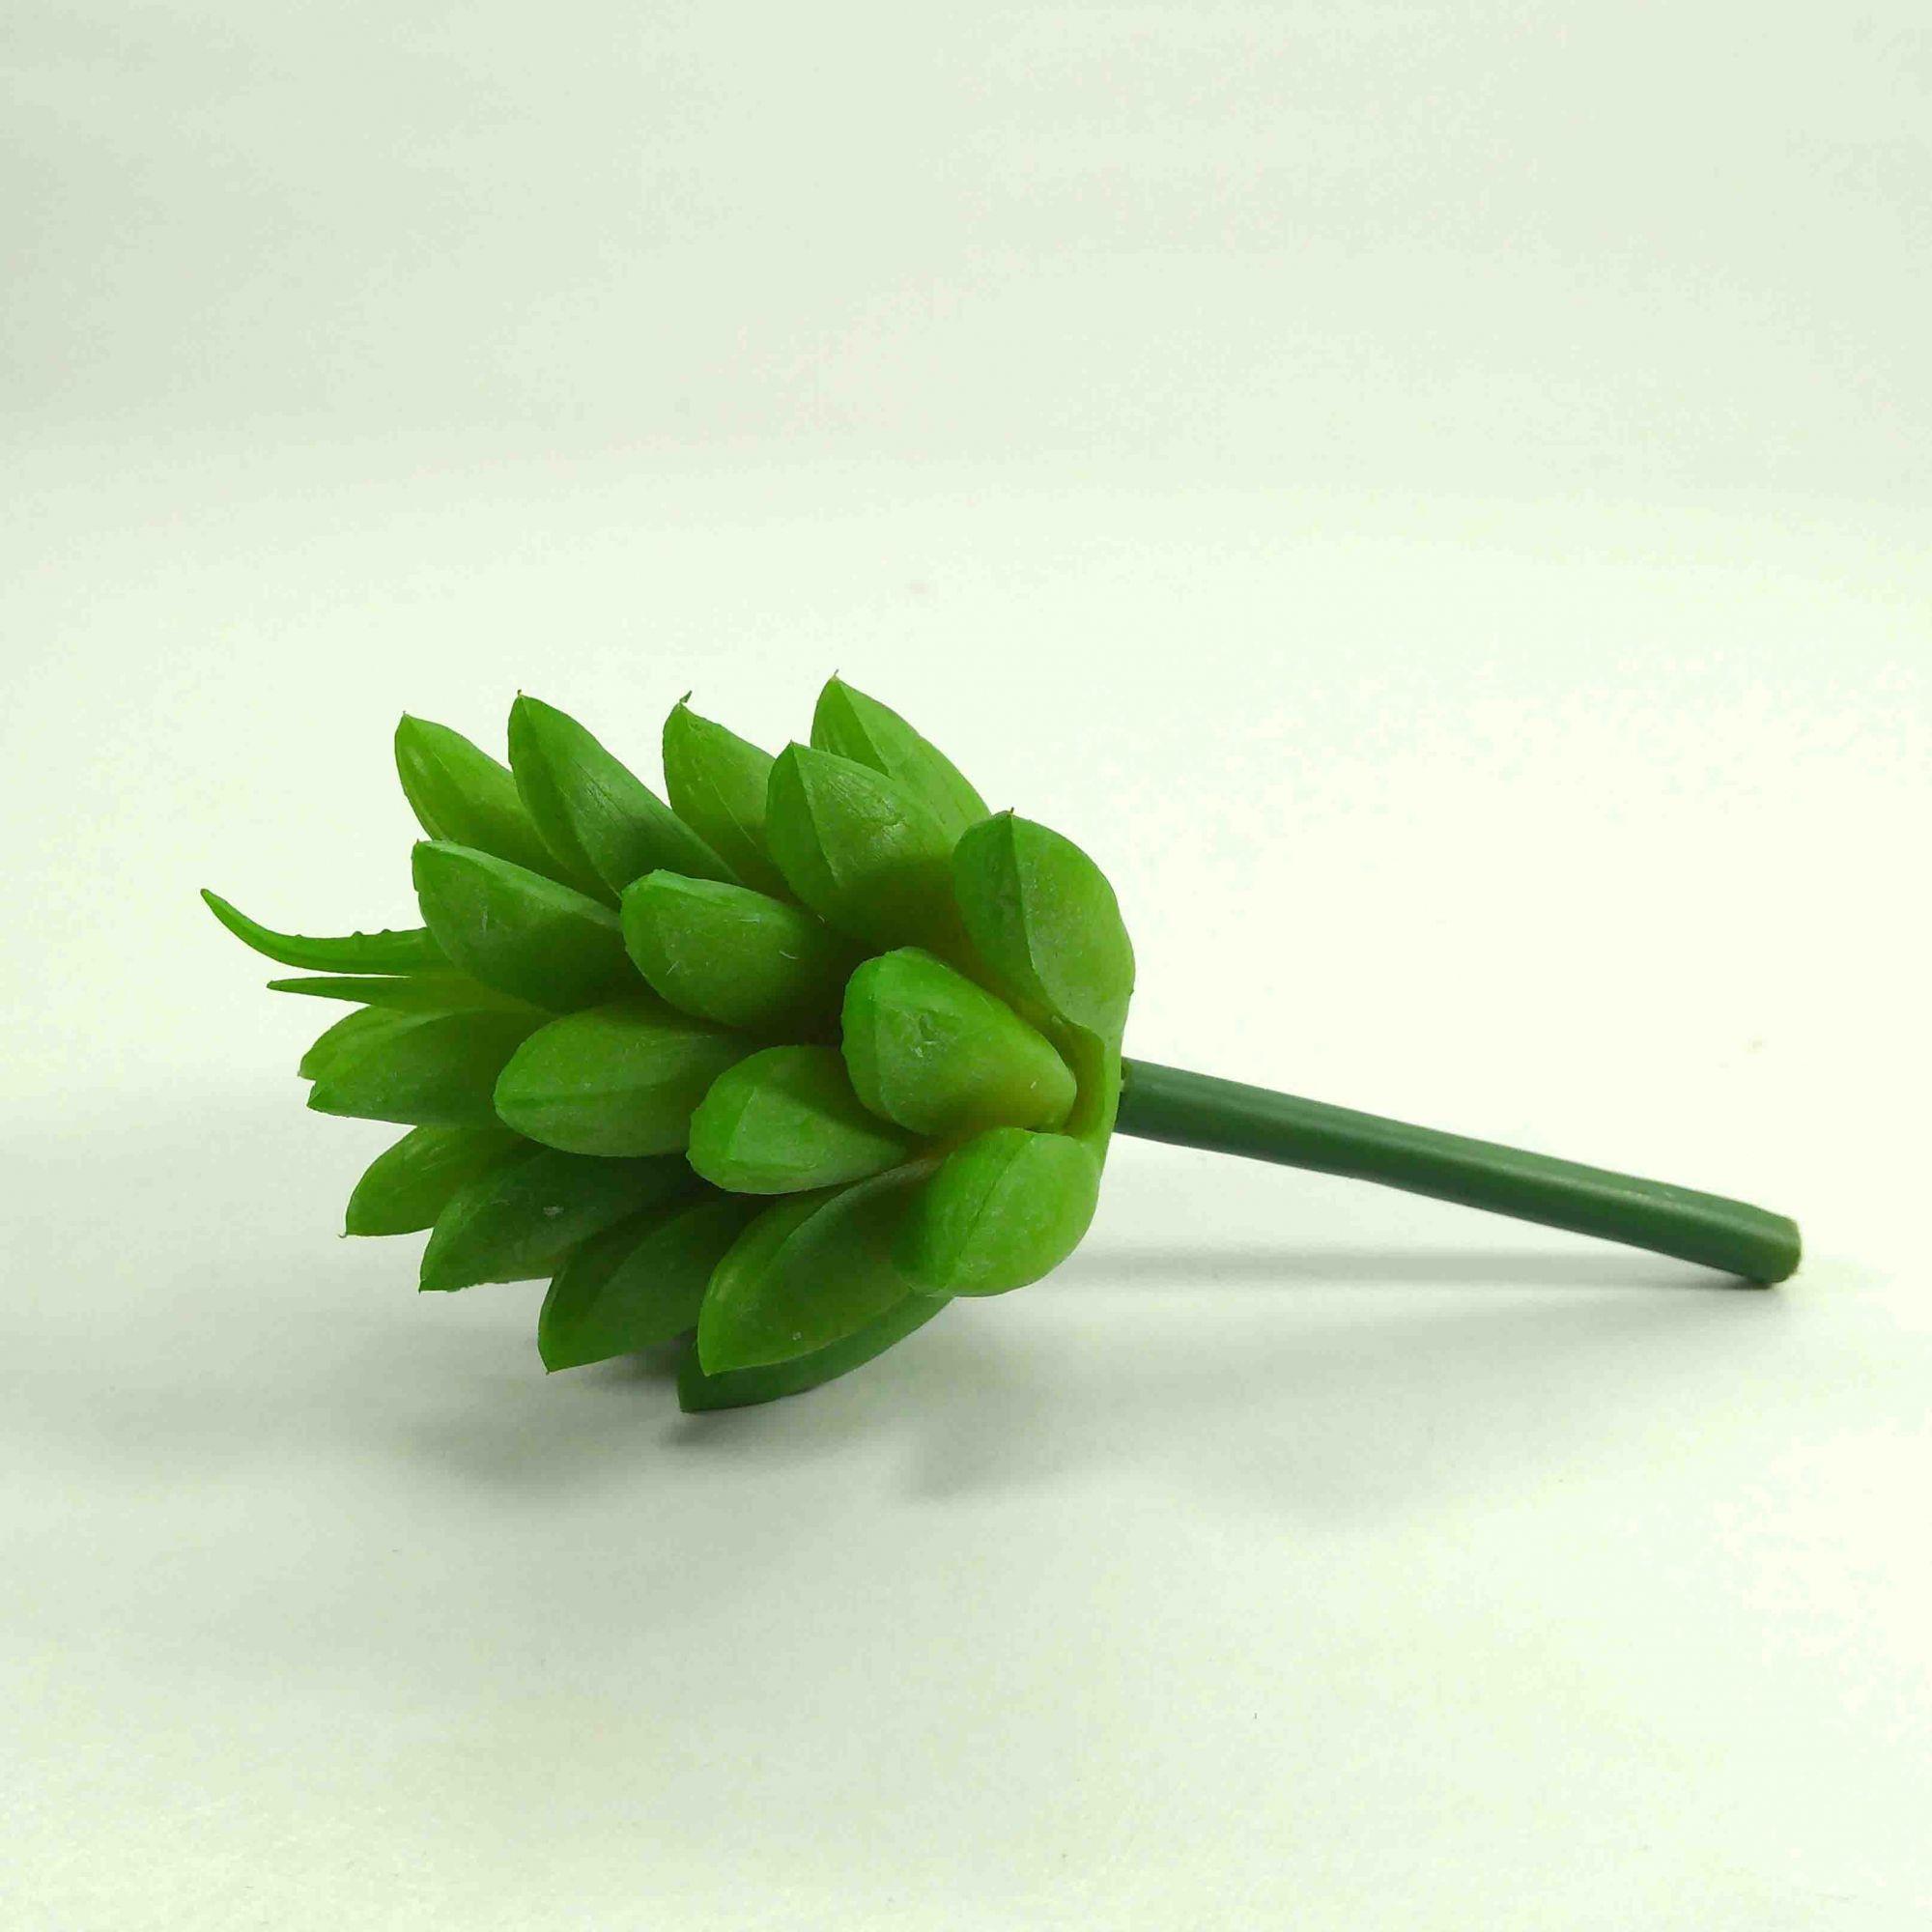 Flor Suculenta Cor Verde Artificial Permanente 9CM 35064-001